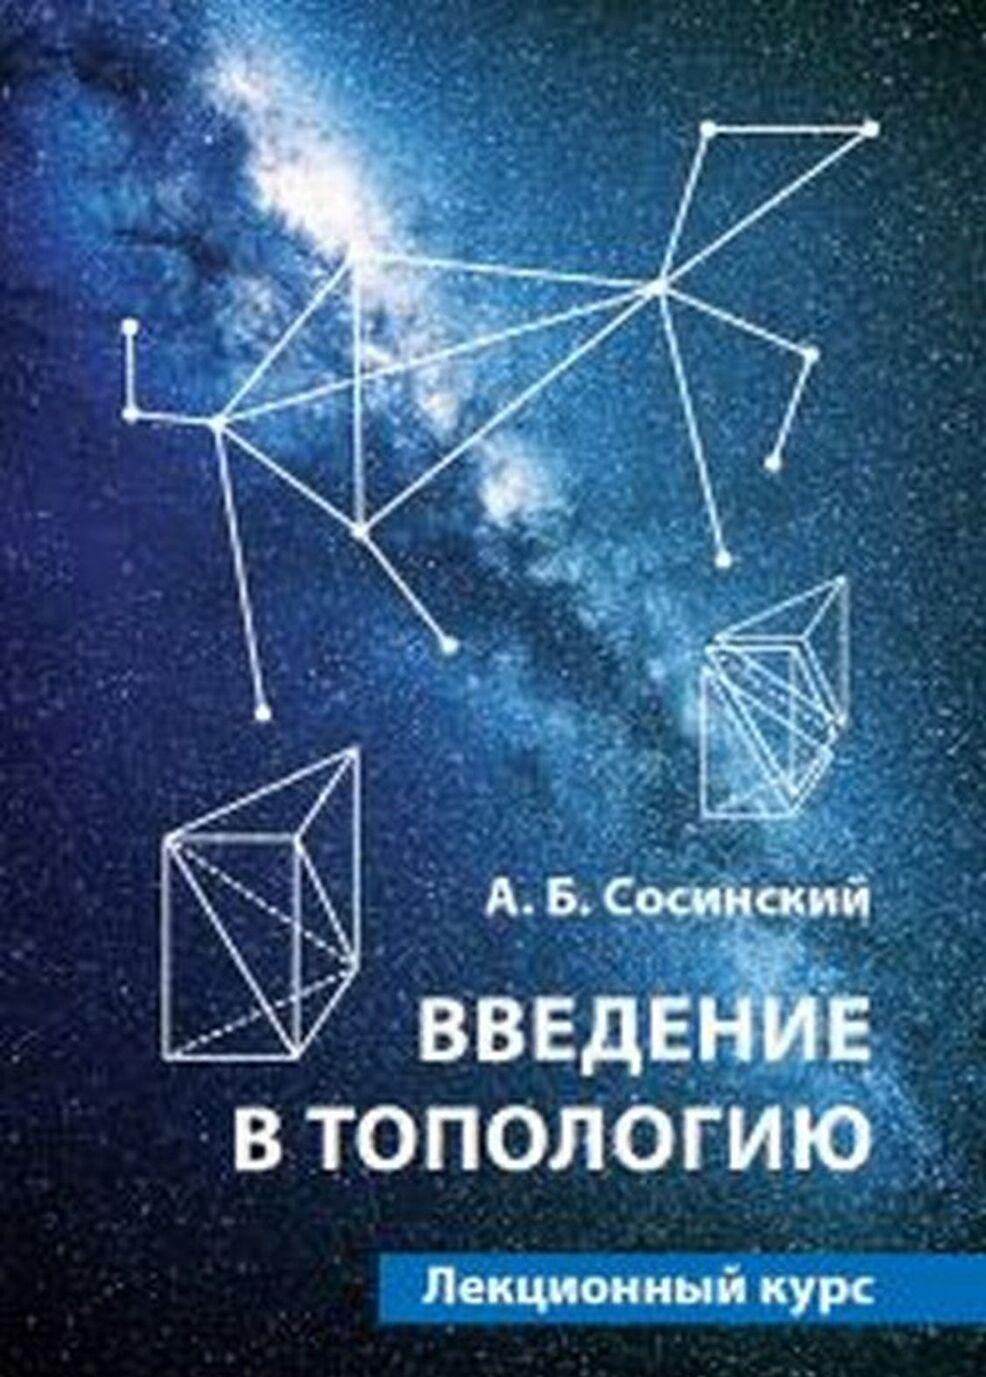 Vvedenie v topologiju. Lektsionnyj kurs